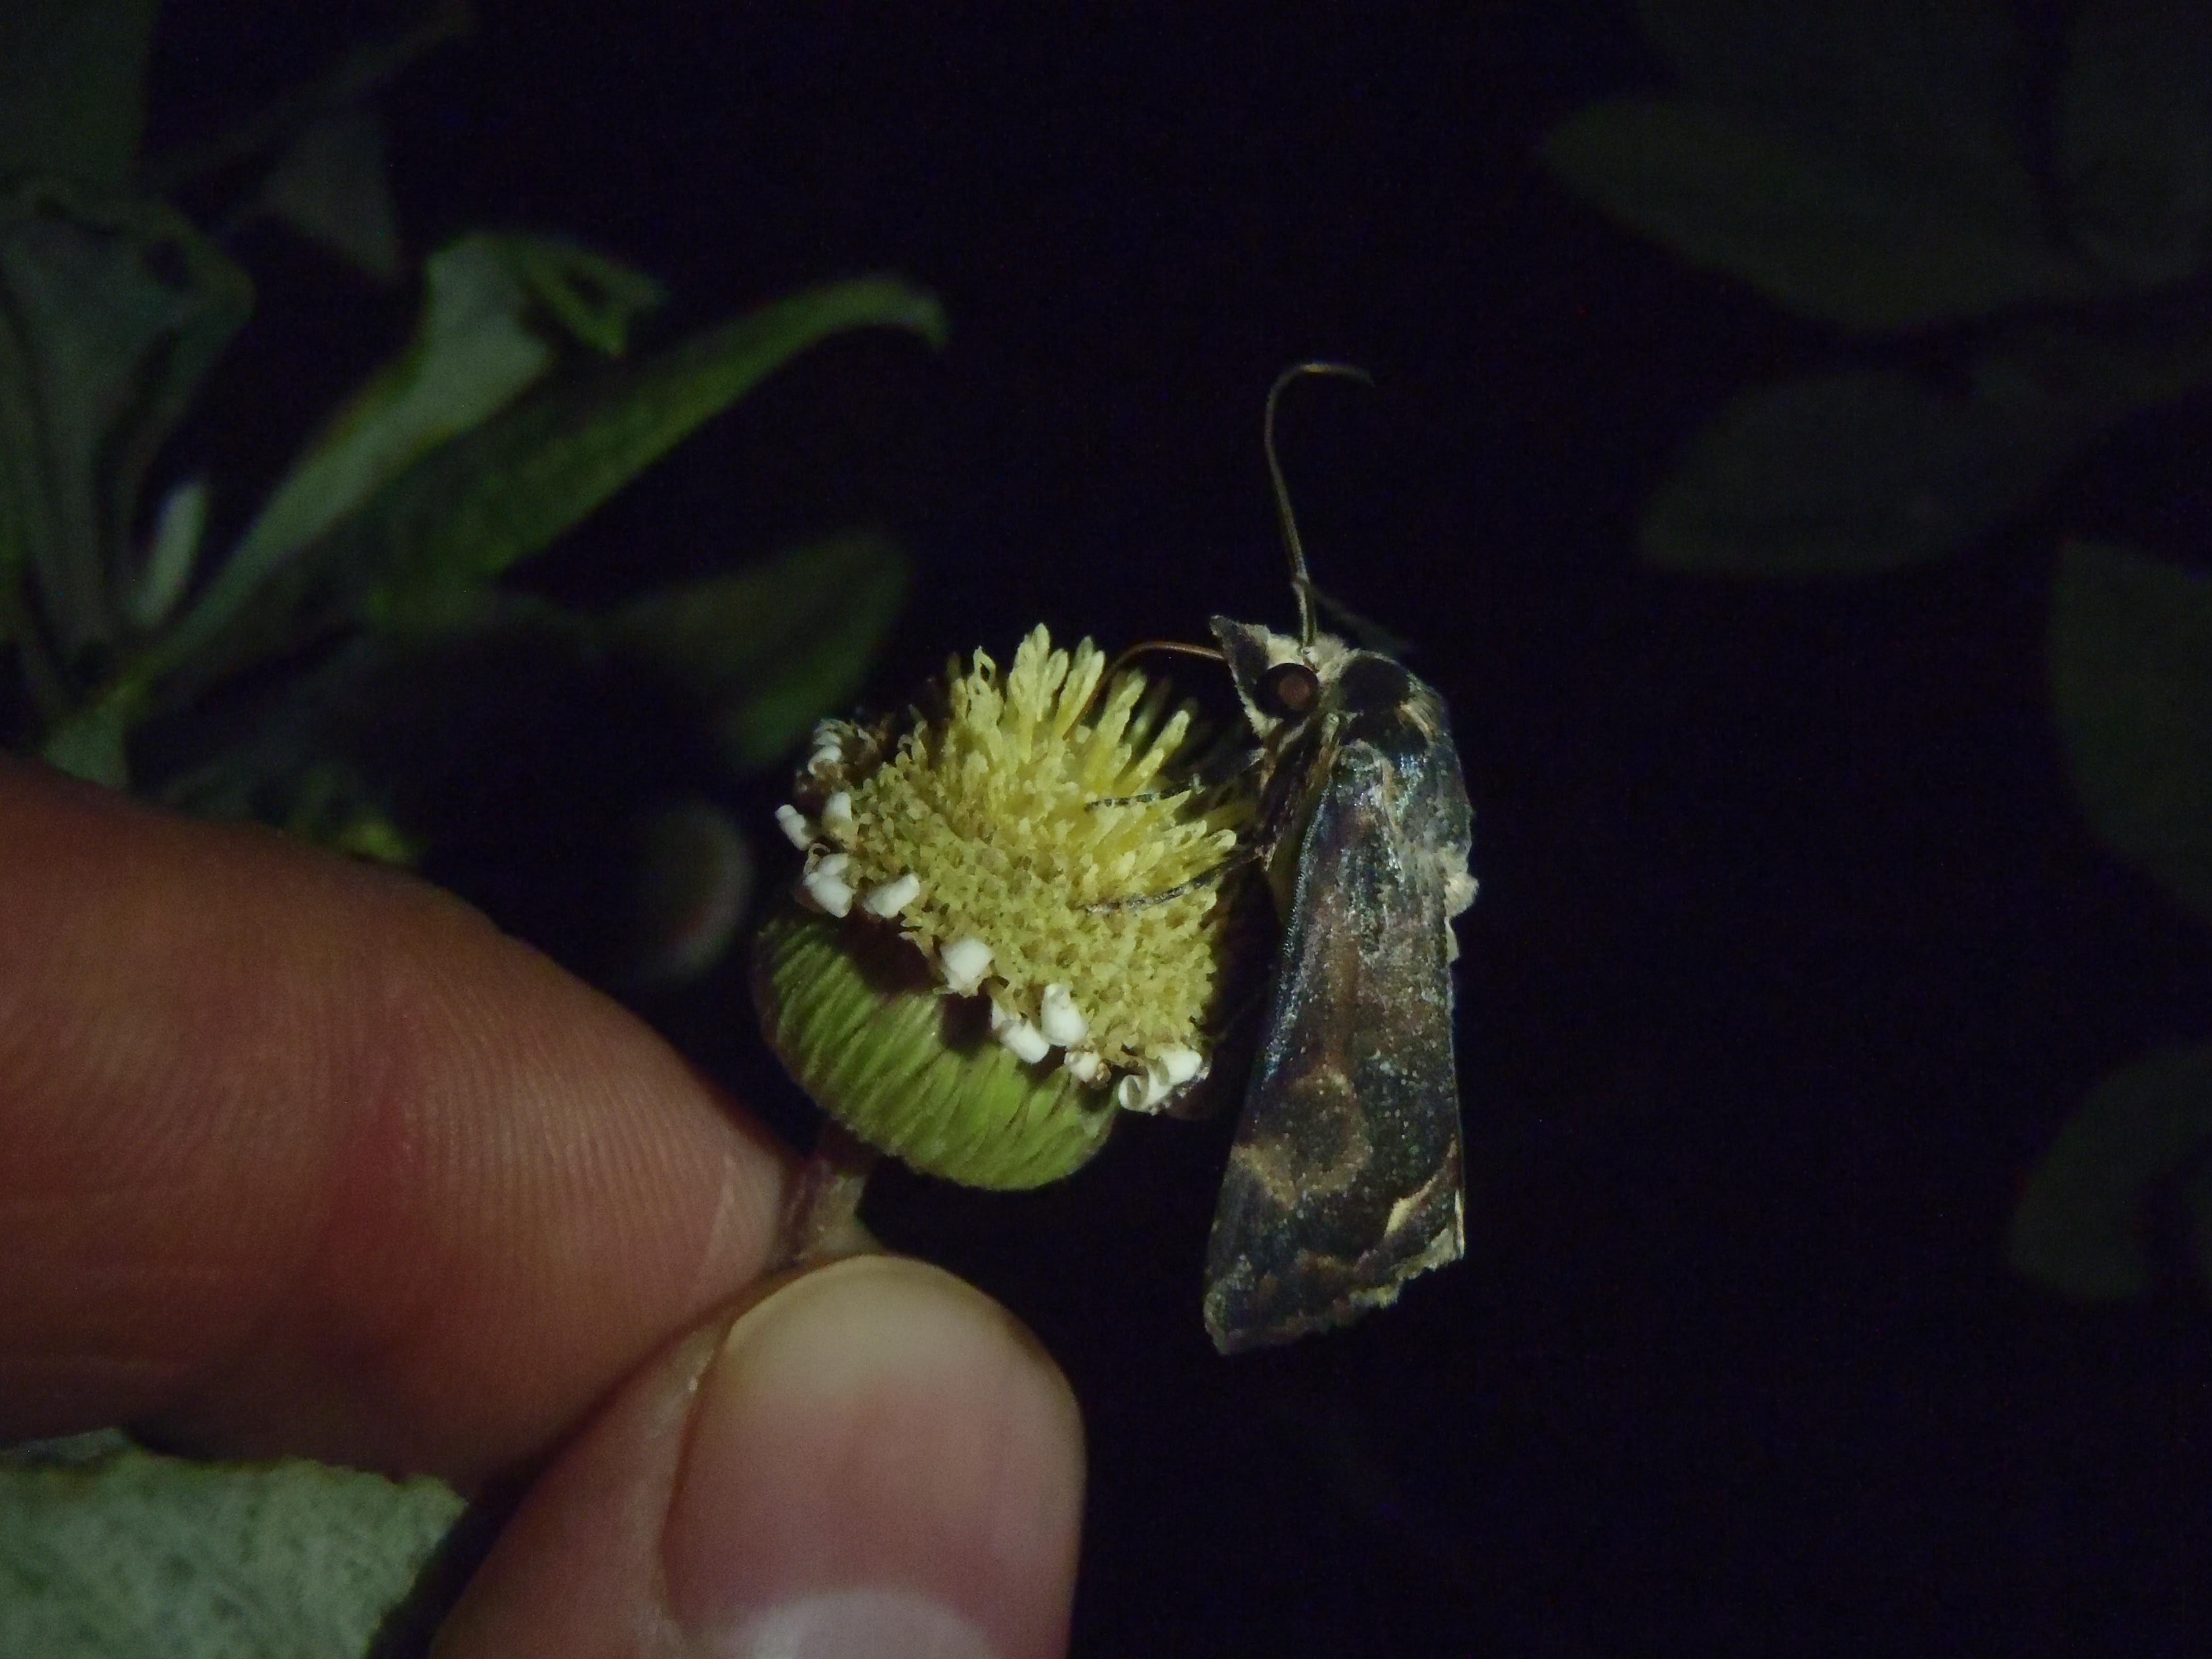 Nightly visit to a St Helena gumwood flower head